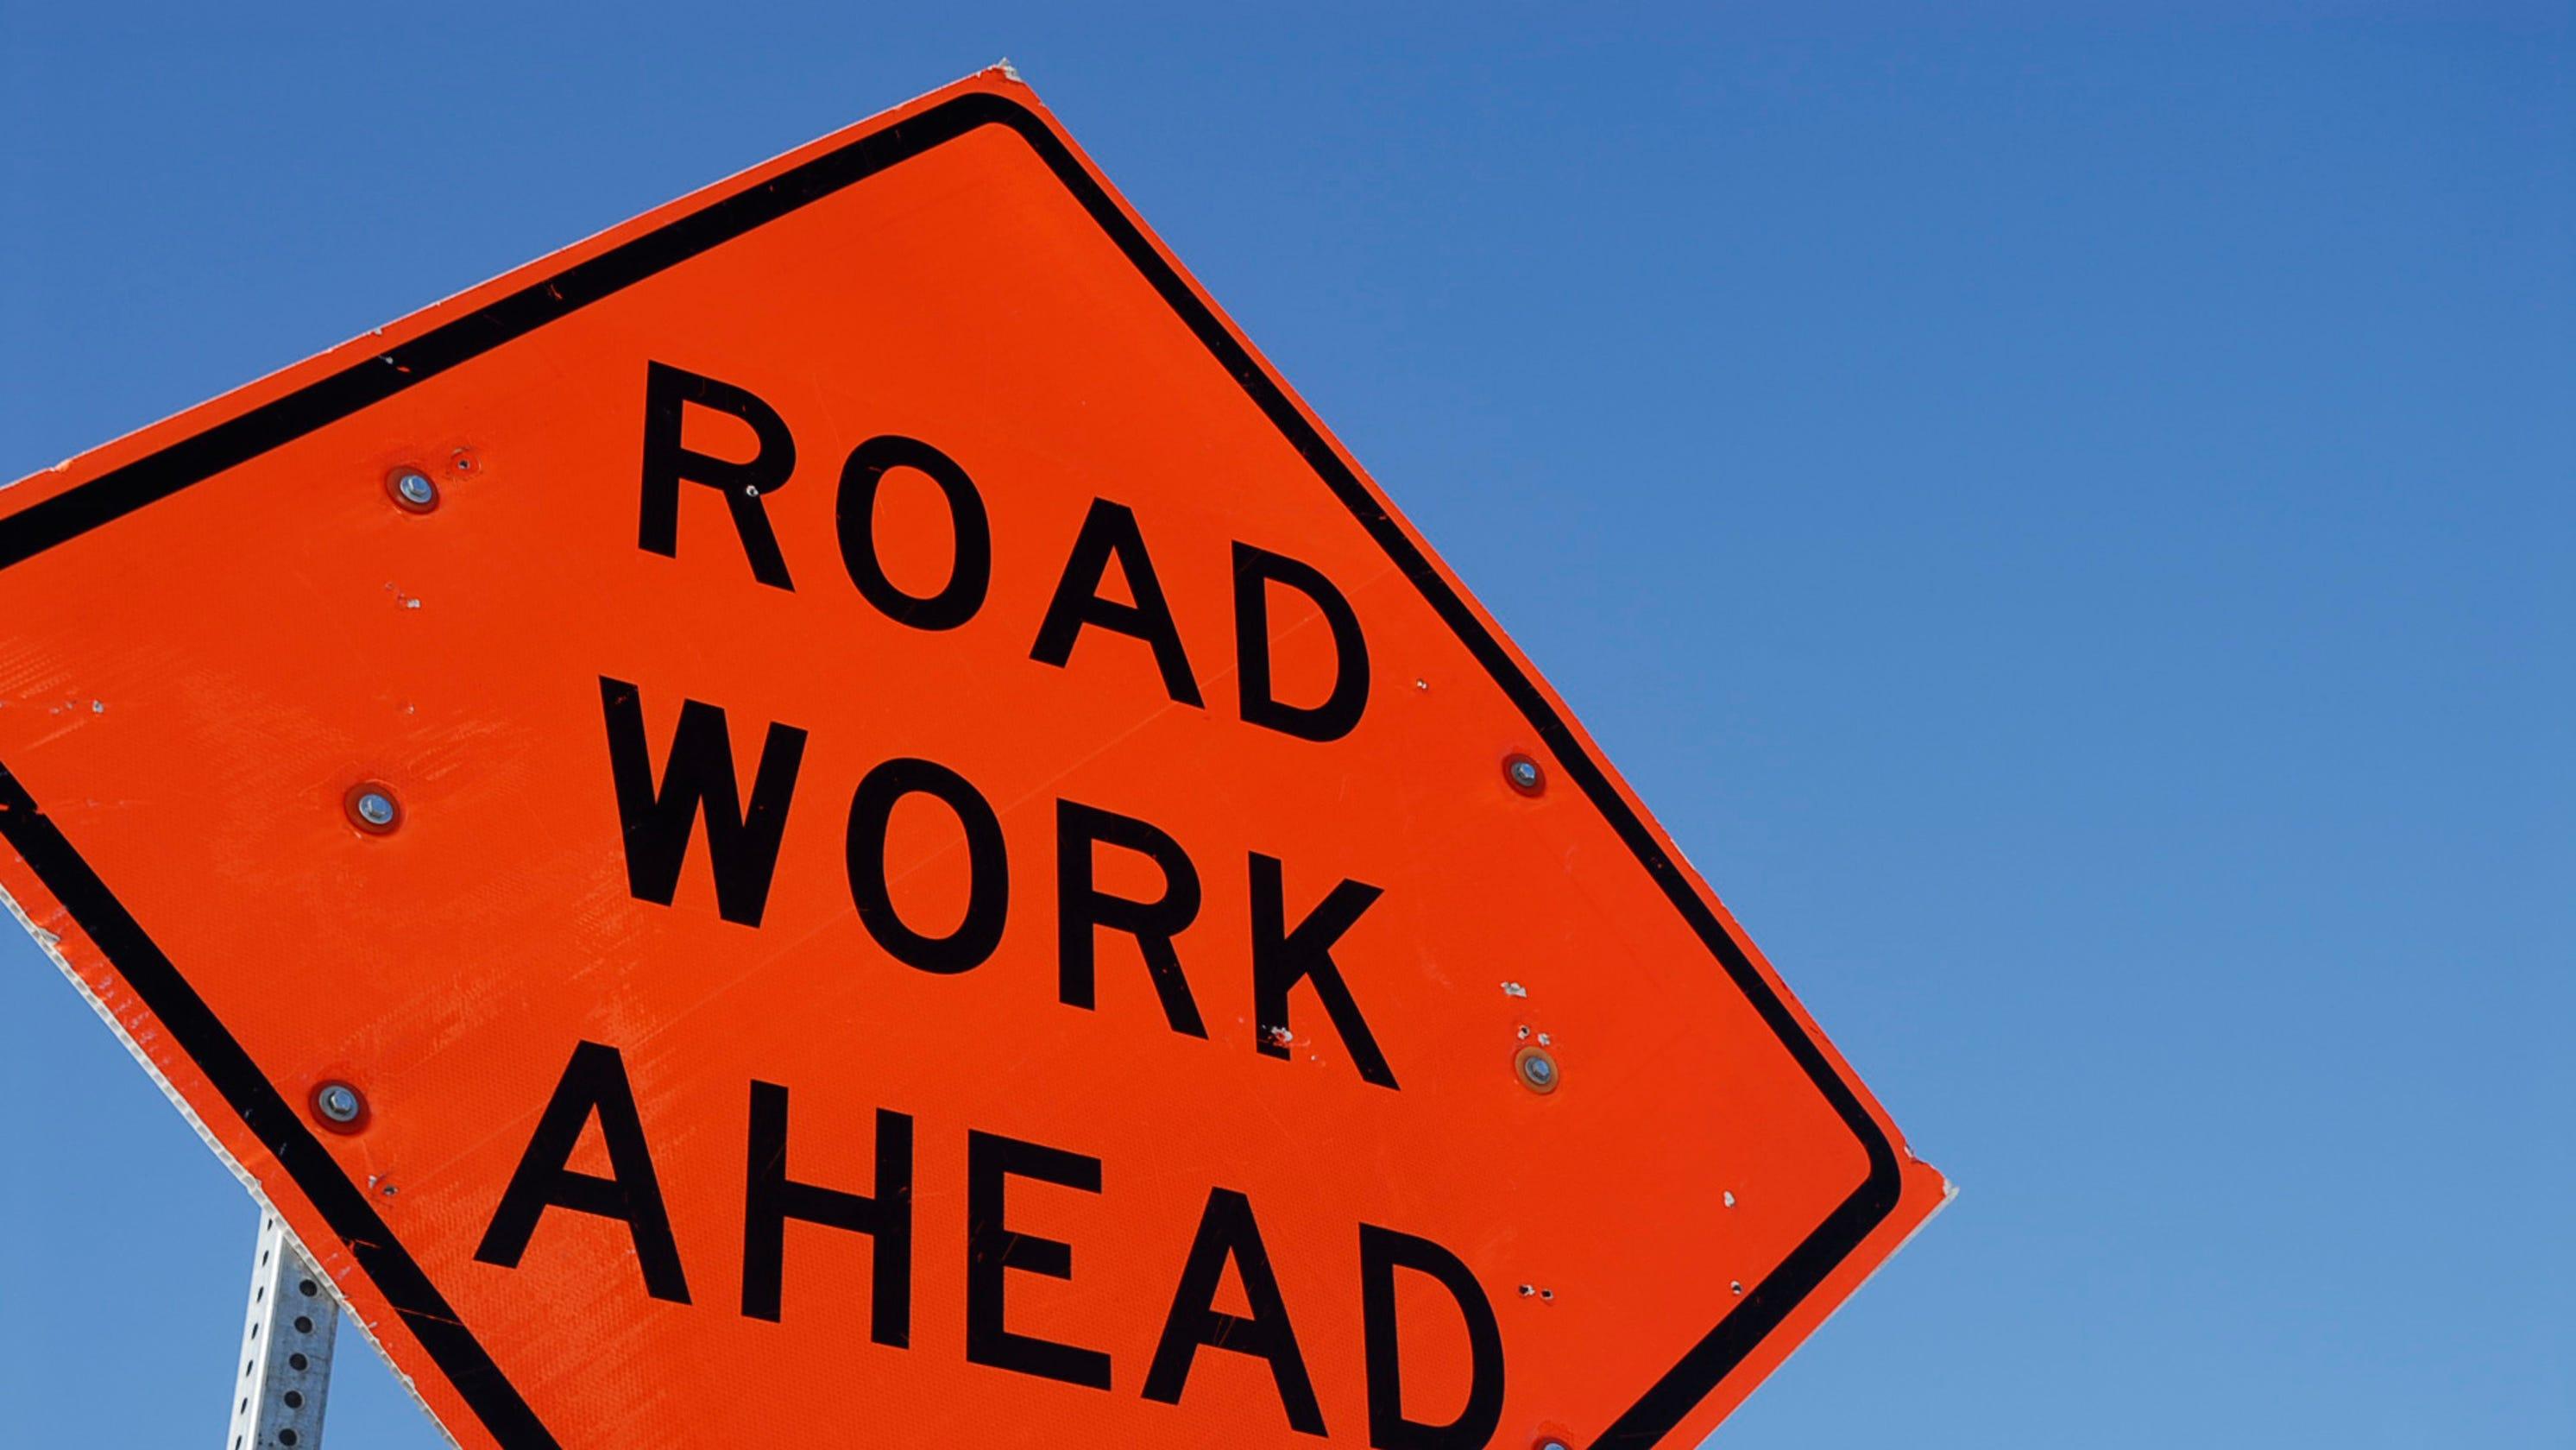 Indianapolis traffic: I-465 detours to avoid closures